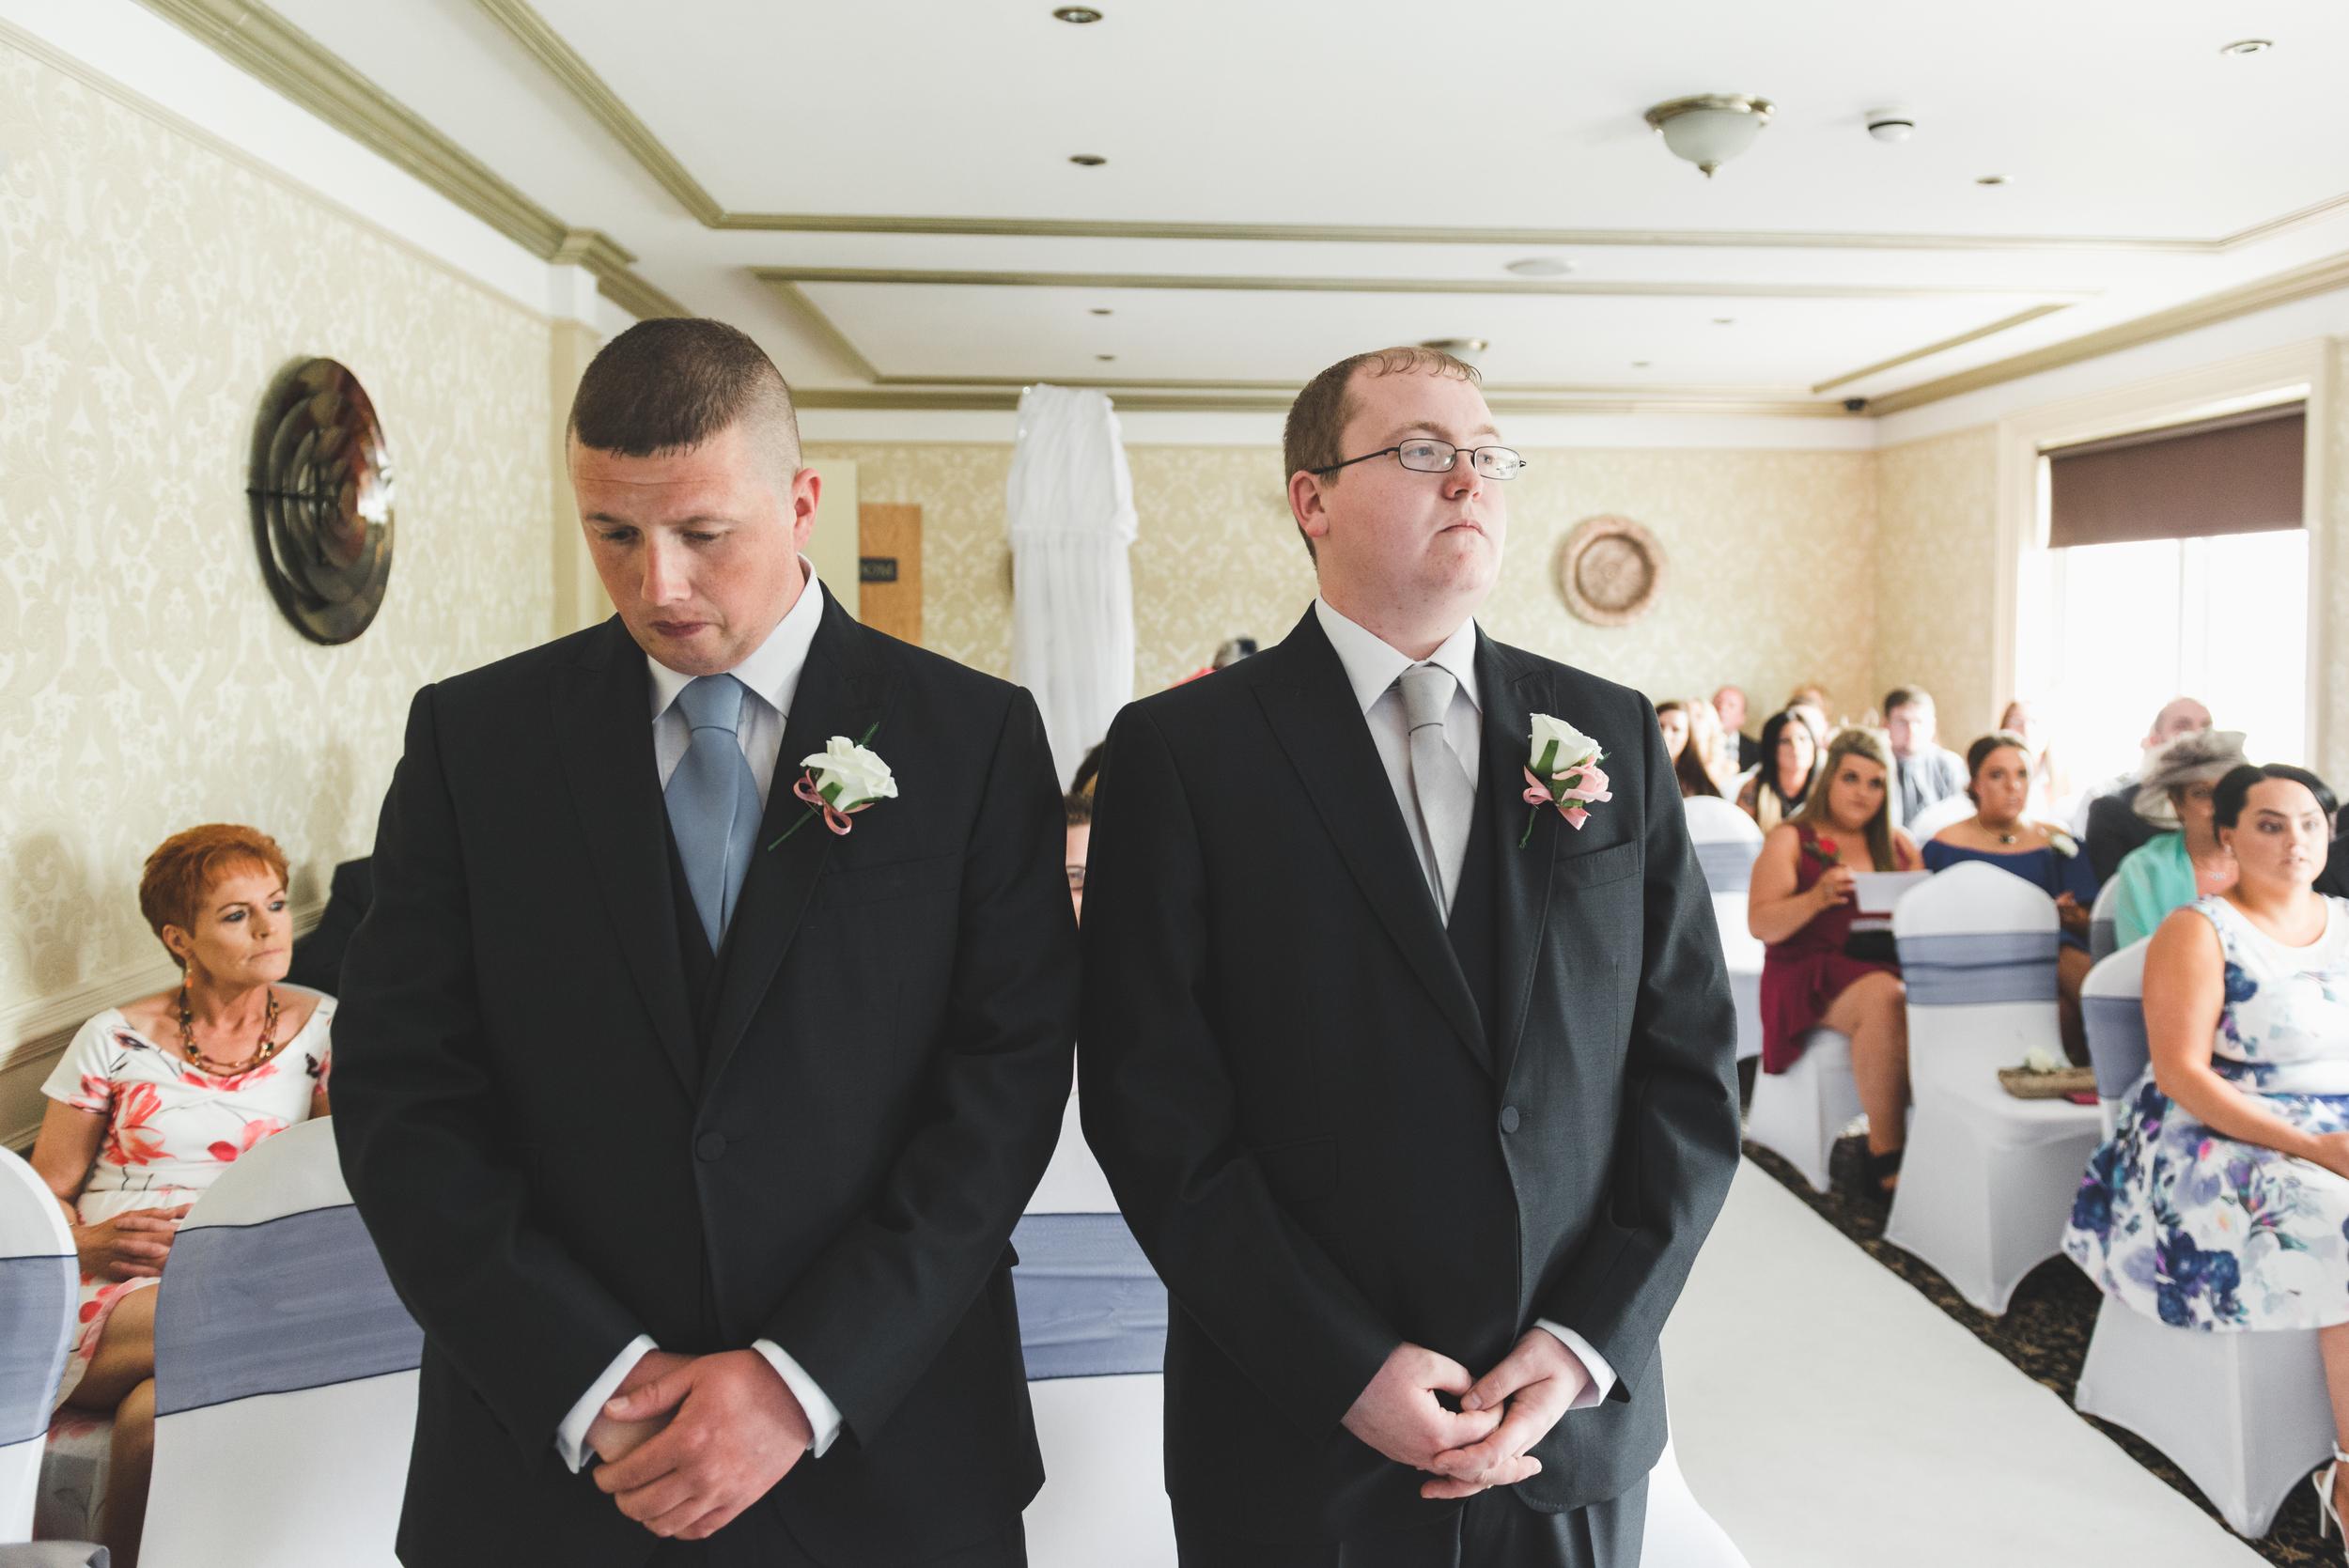 Ballymac_hotel_wedding_lisburn_groom_bestman_waiting